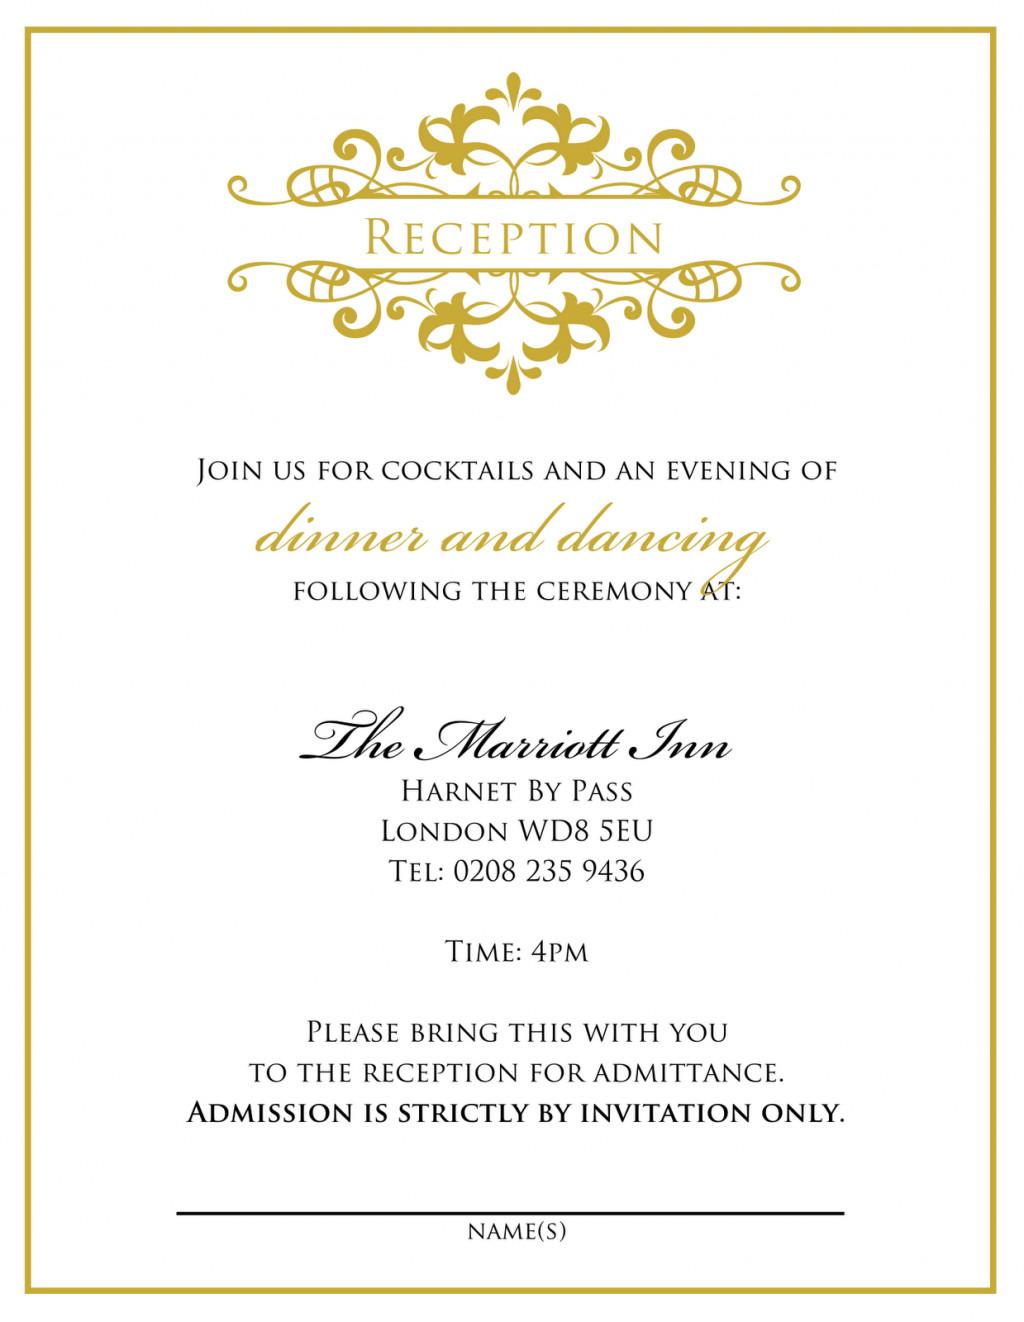 Wedding Reception Invite Templates Wedding Invitation Wording From Bride and Groom